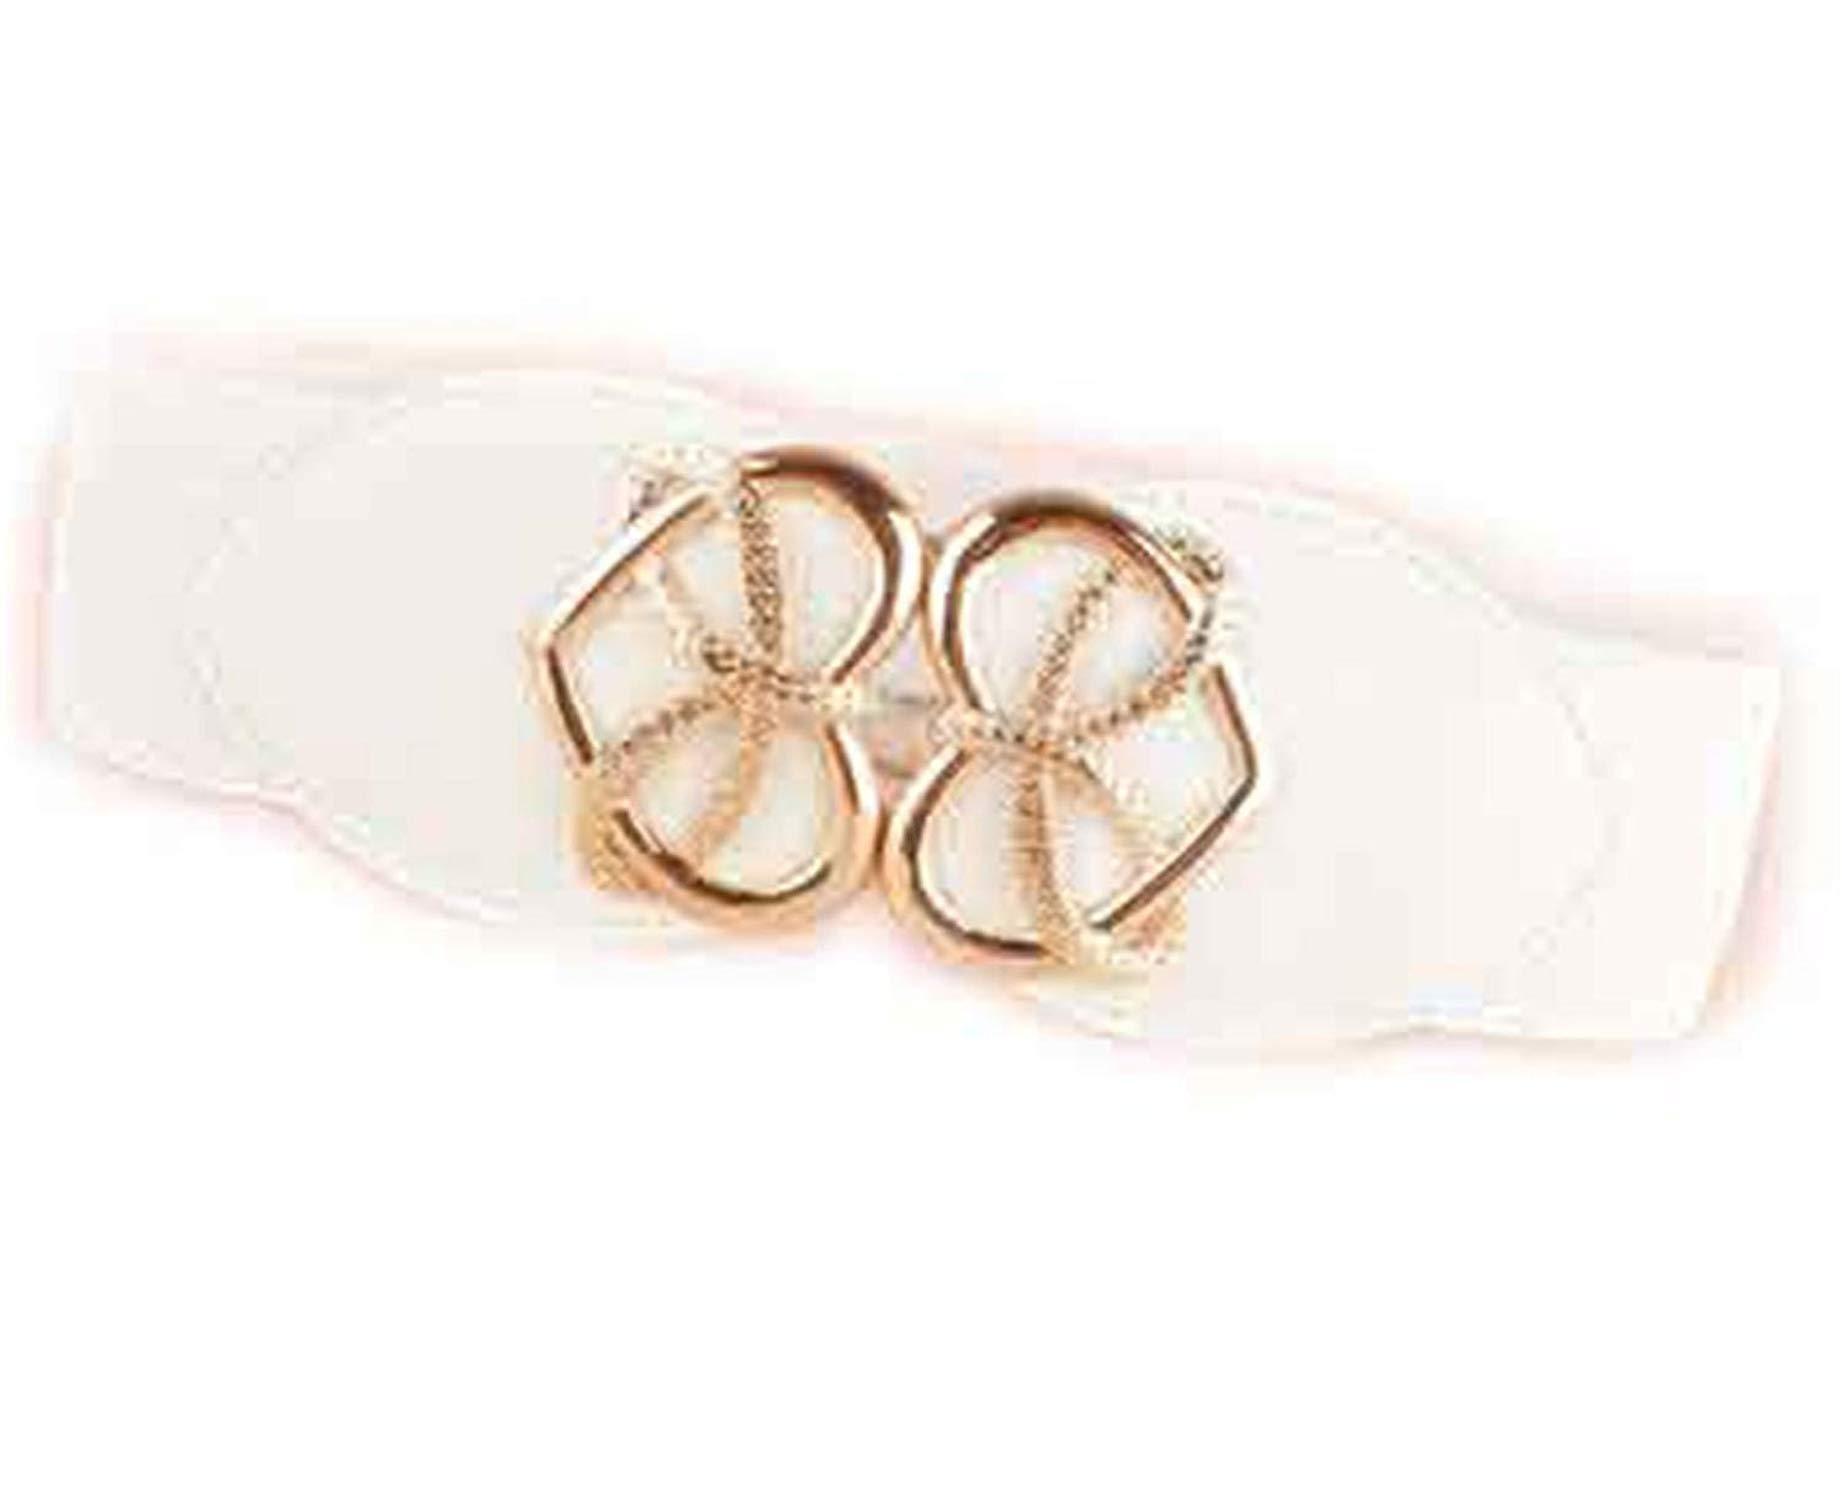 Mistere Nice Fashion Women's Cummerbund gold heart buckle Belt Wide WaistBand Female Leather Cummerbunds for Dresses,OneSize,White Color